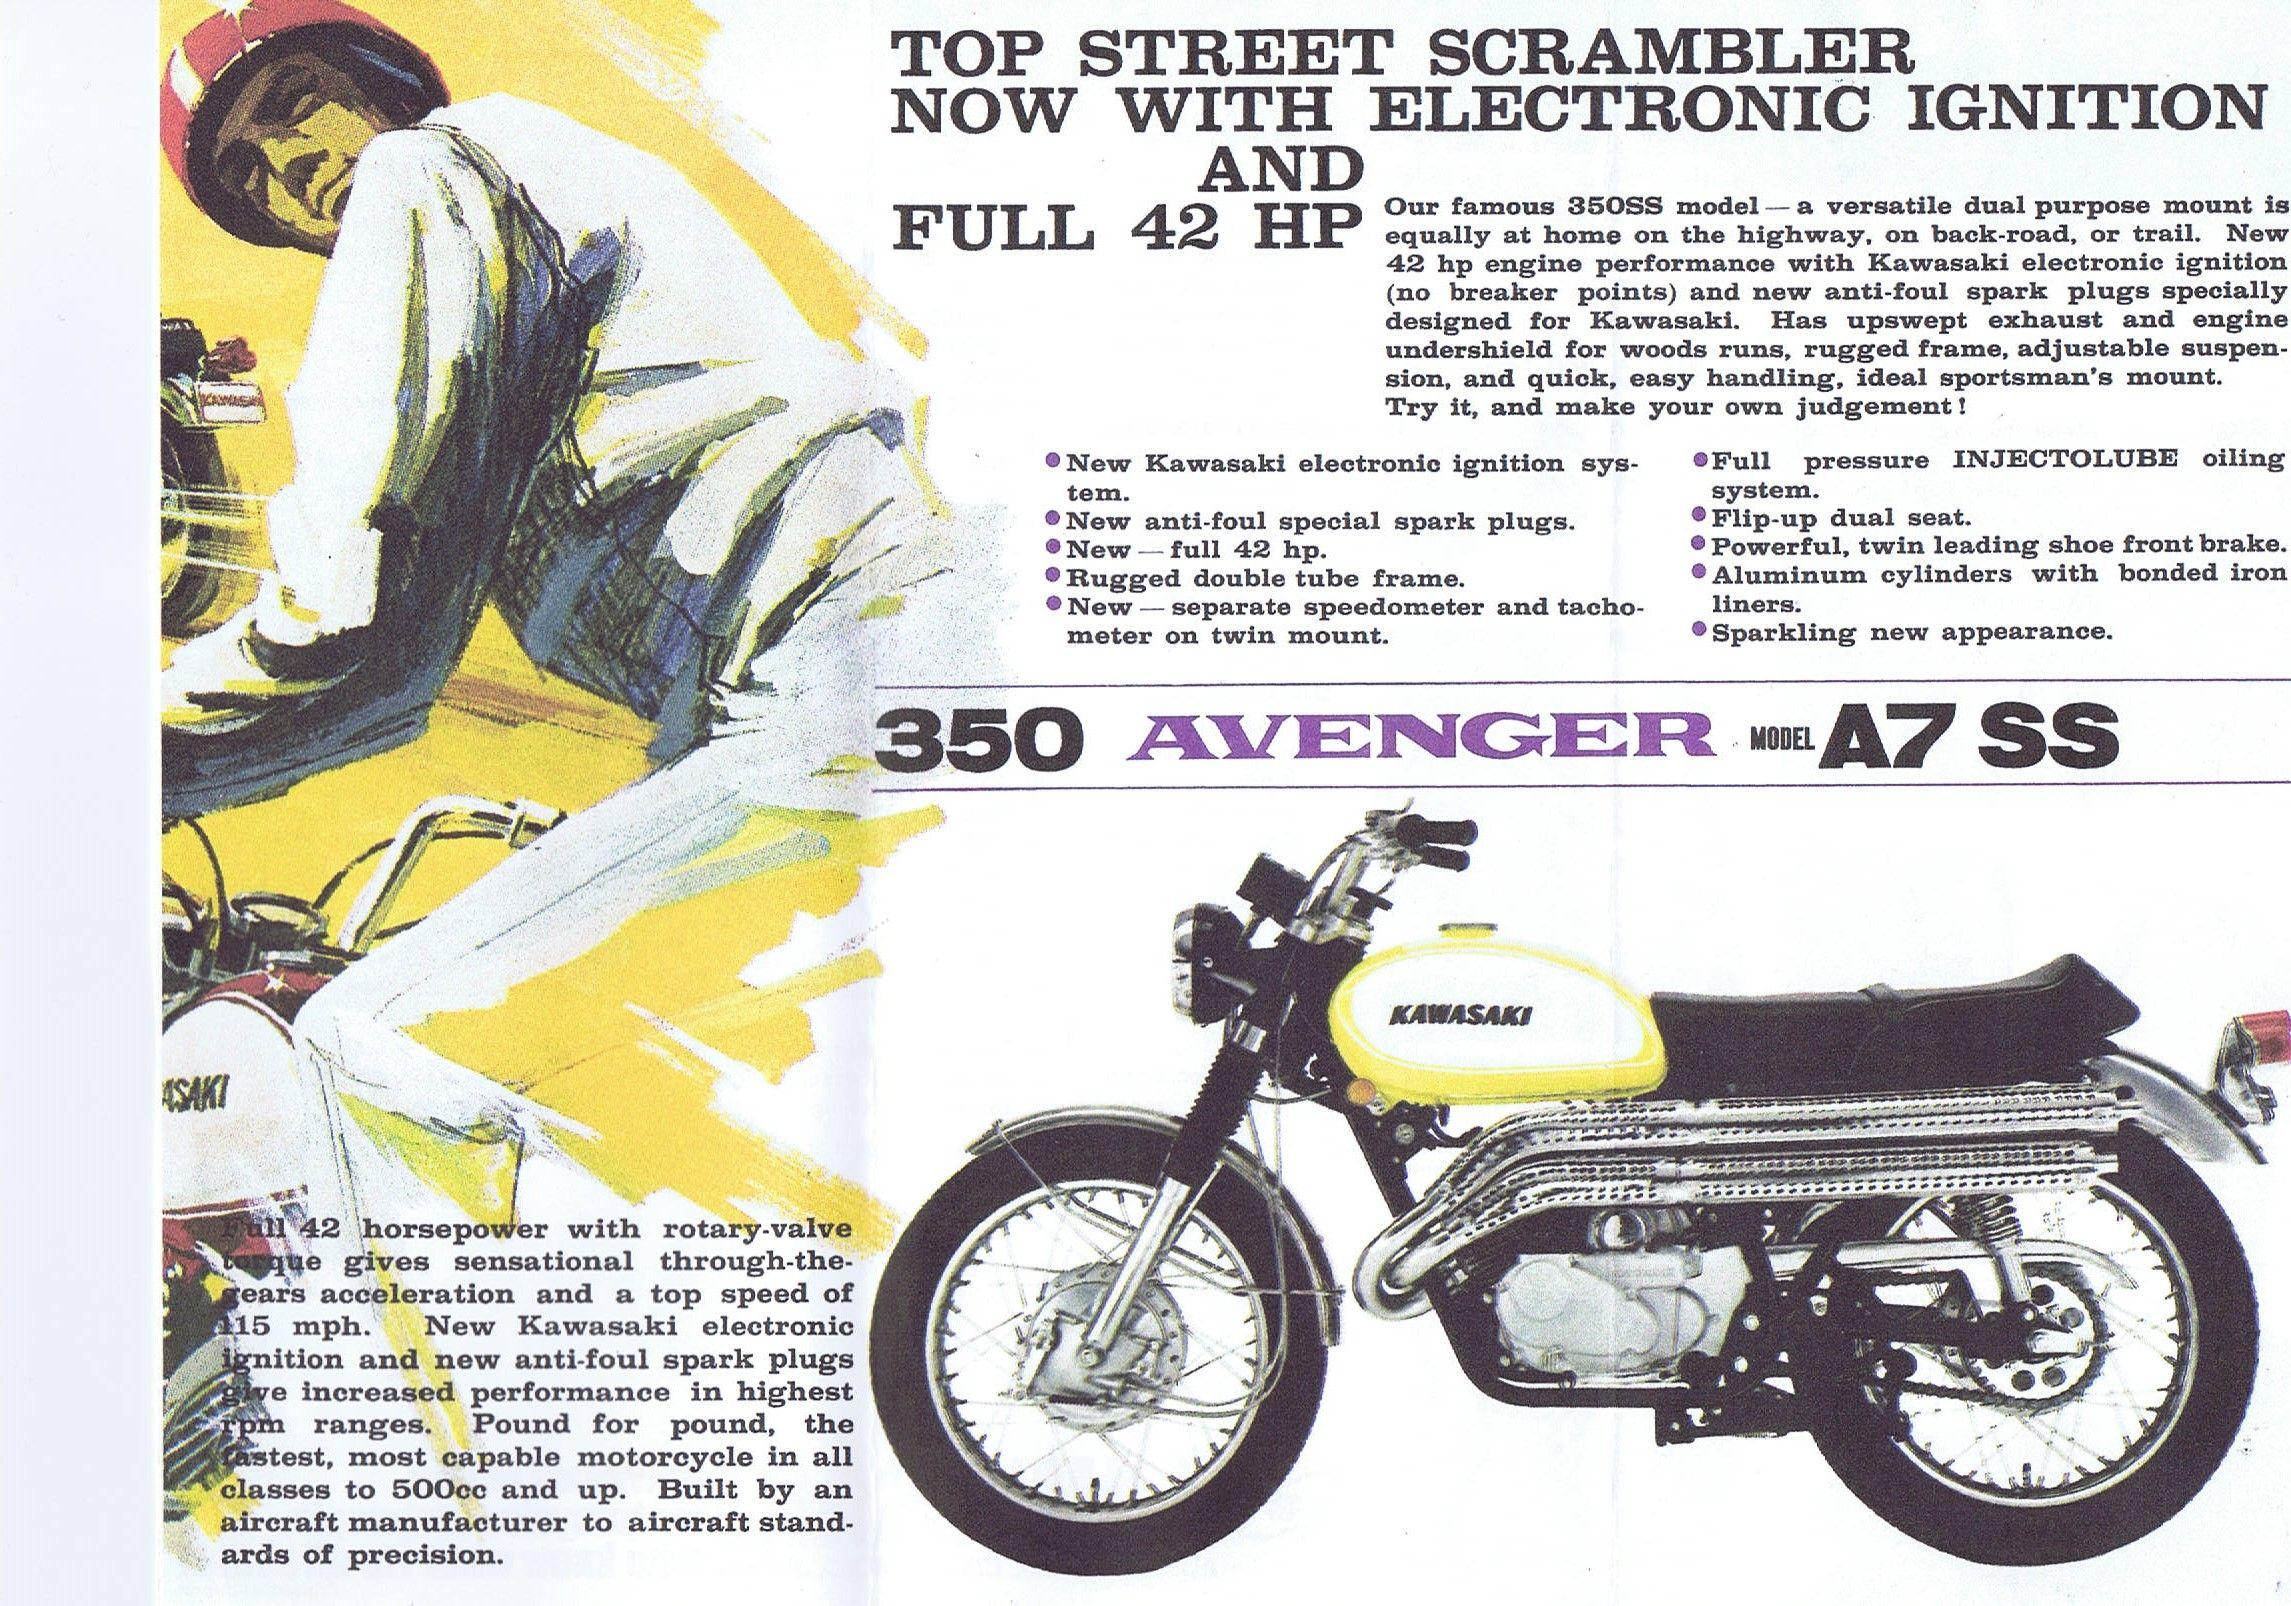 1968 Kawasaki 350 Avenger A7 A7 SS 2 stroke brochure USA 03